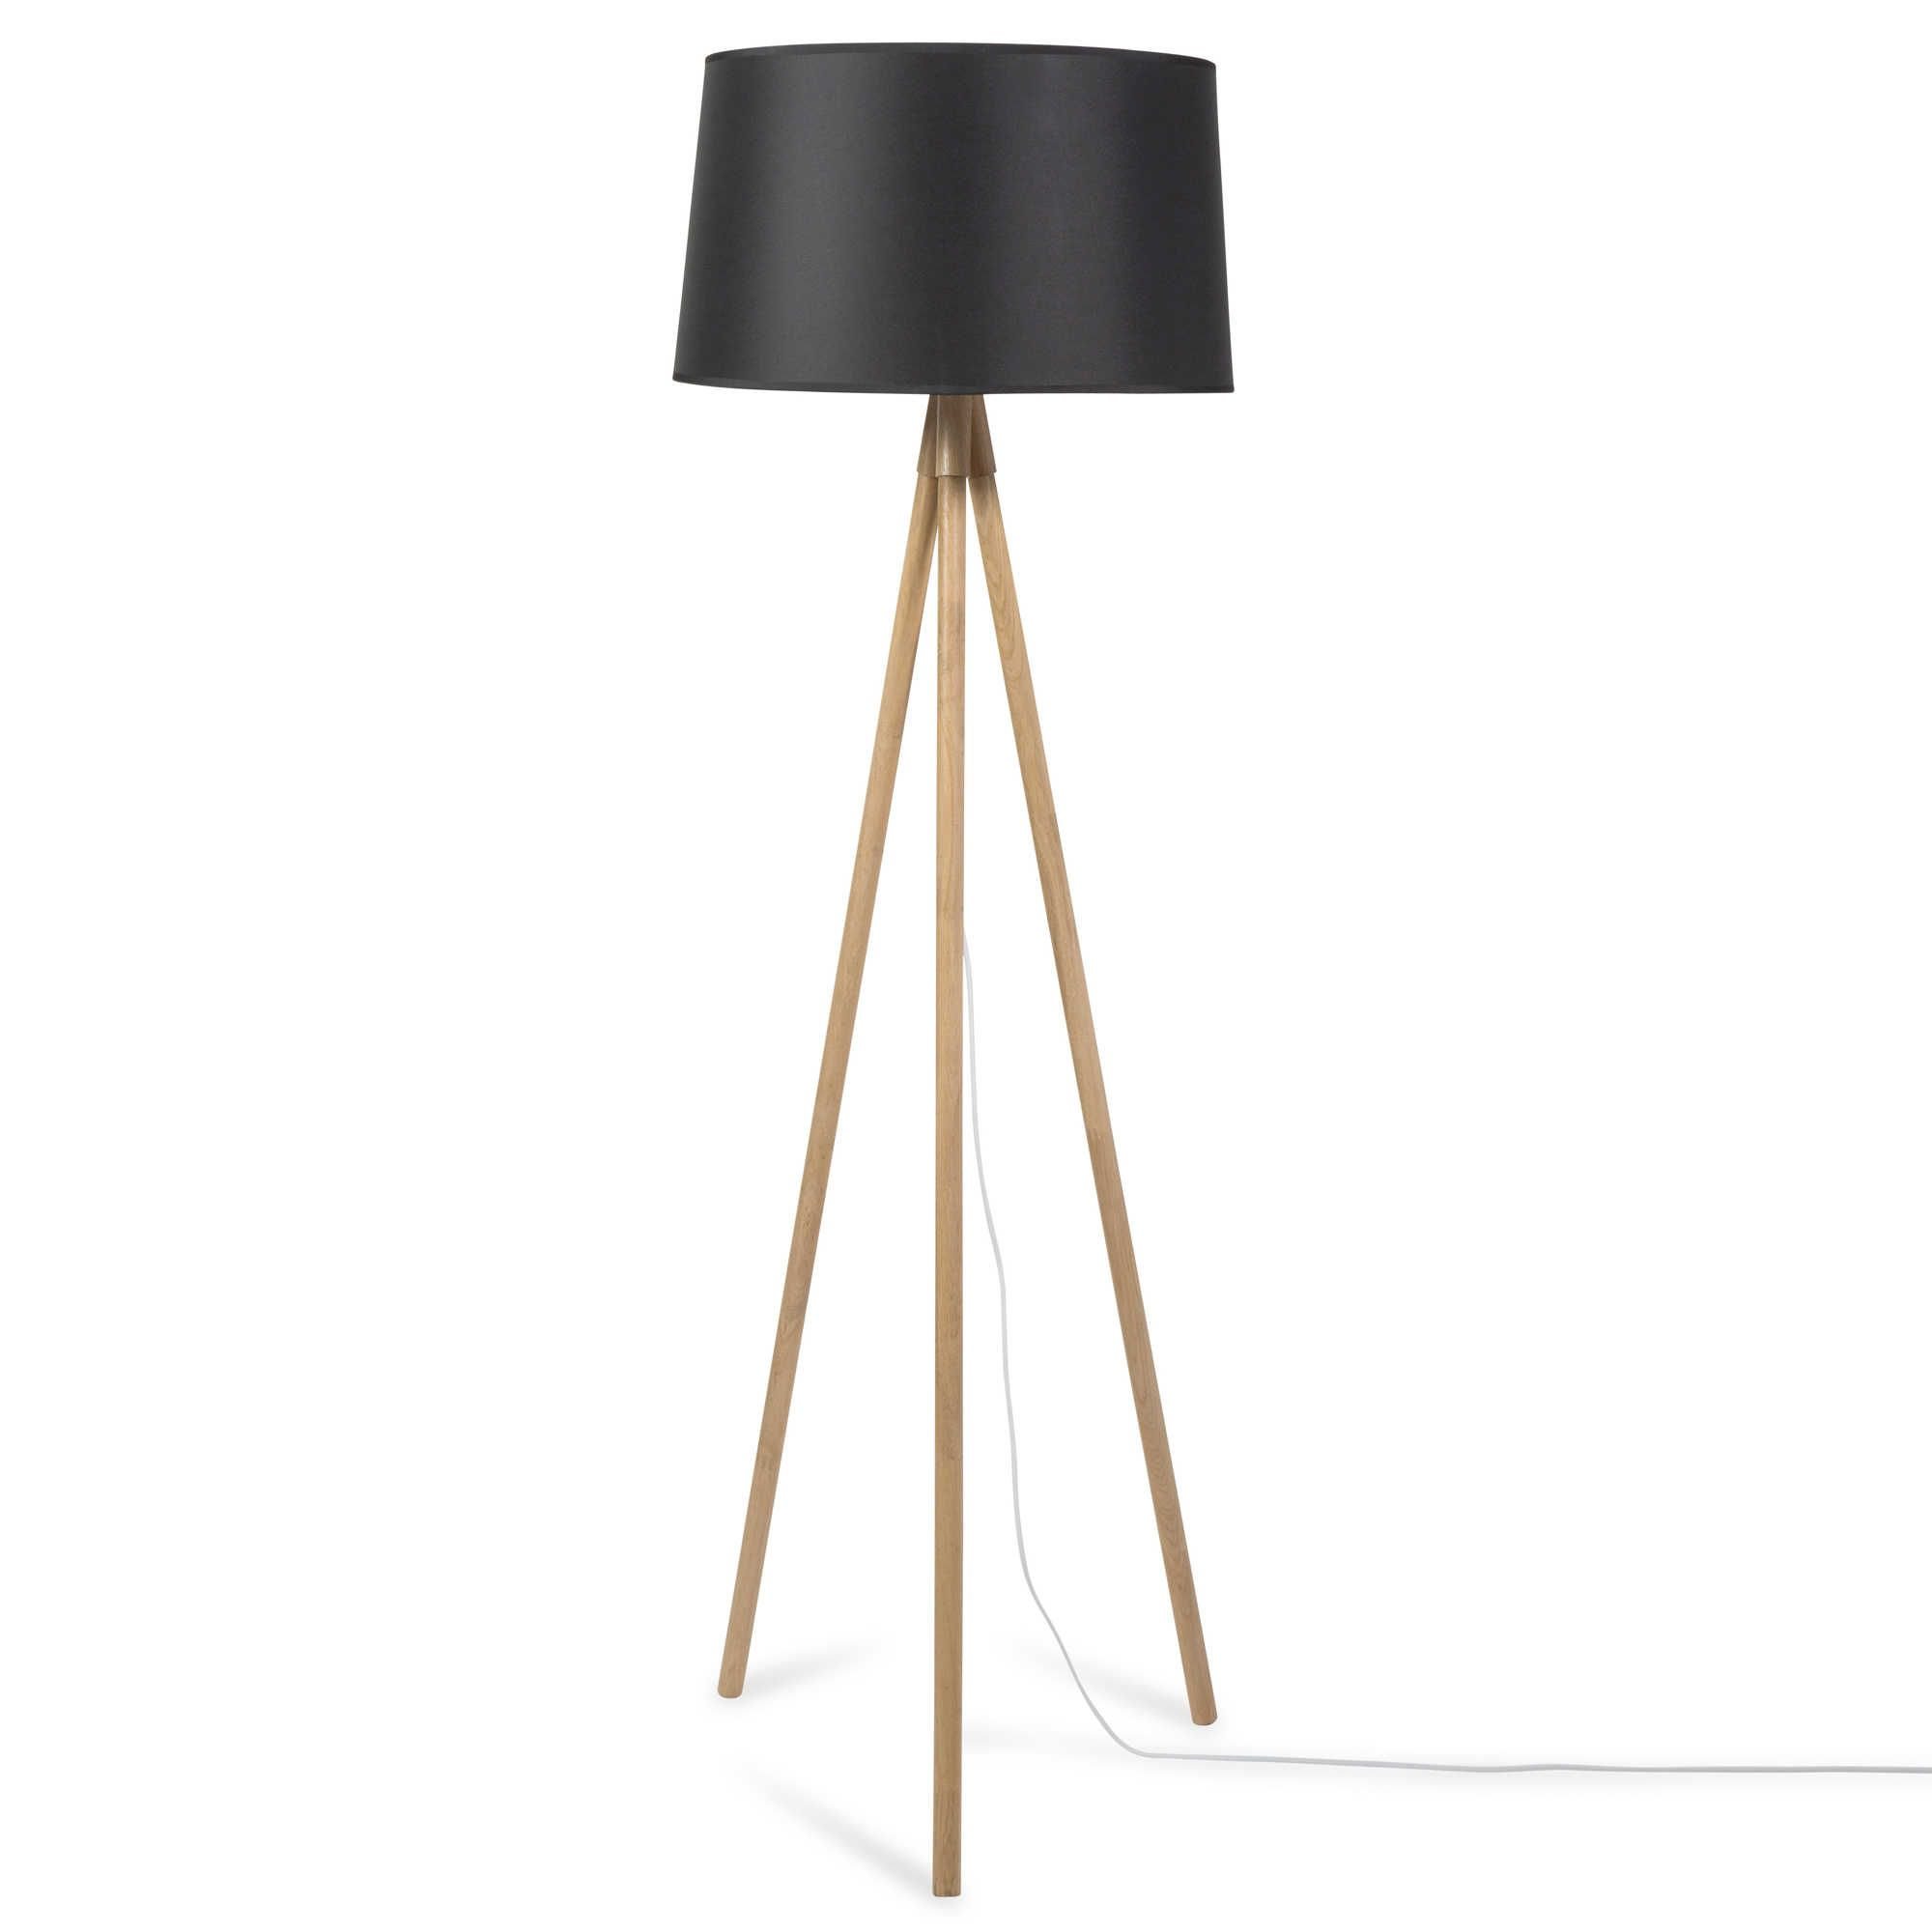 super lampadaire trepied bois design gx08 montrealeast. Black Bedroom Furniture Sets. Home Design Ideas